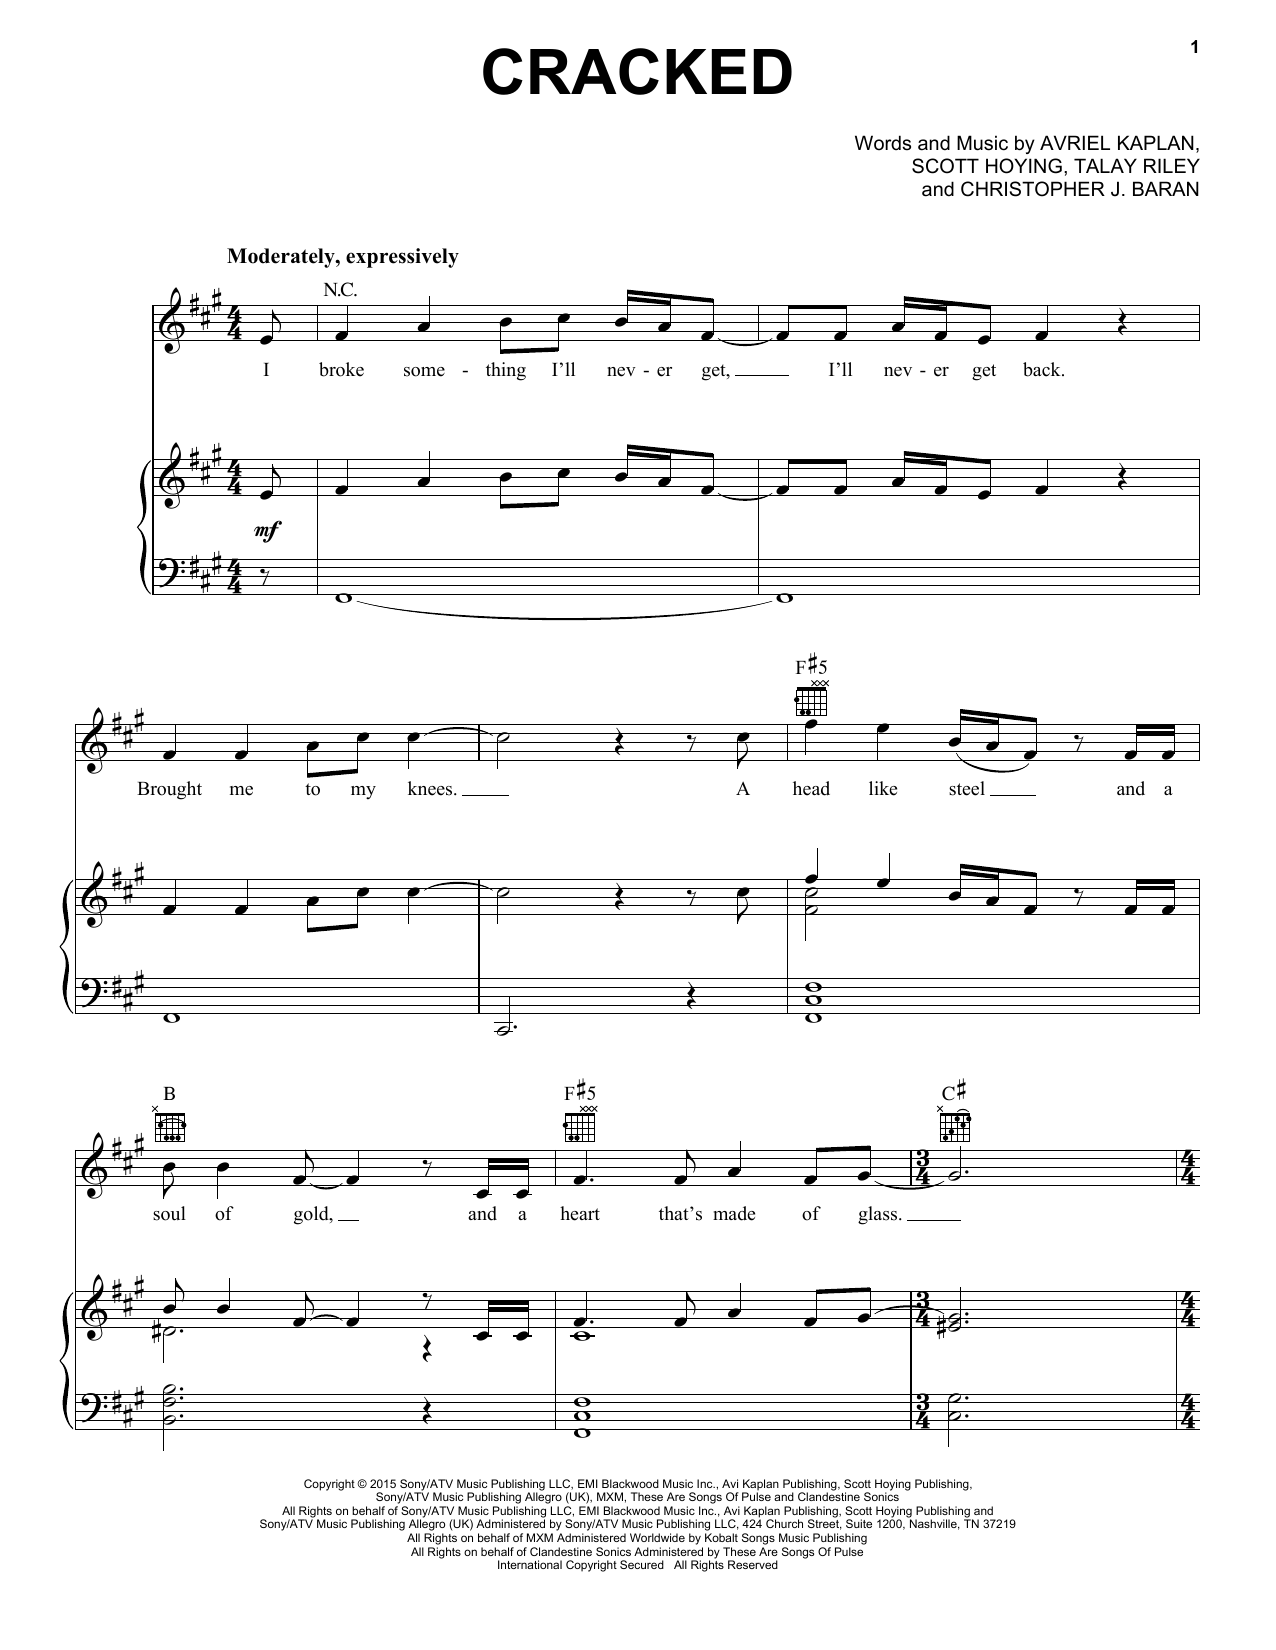 Pentatonix Cracked sheet music notes and chords. Download Printable PDF.